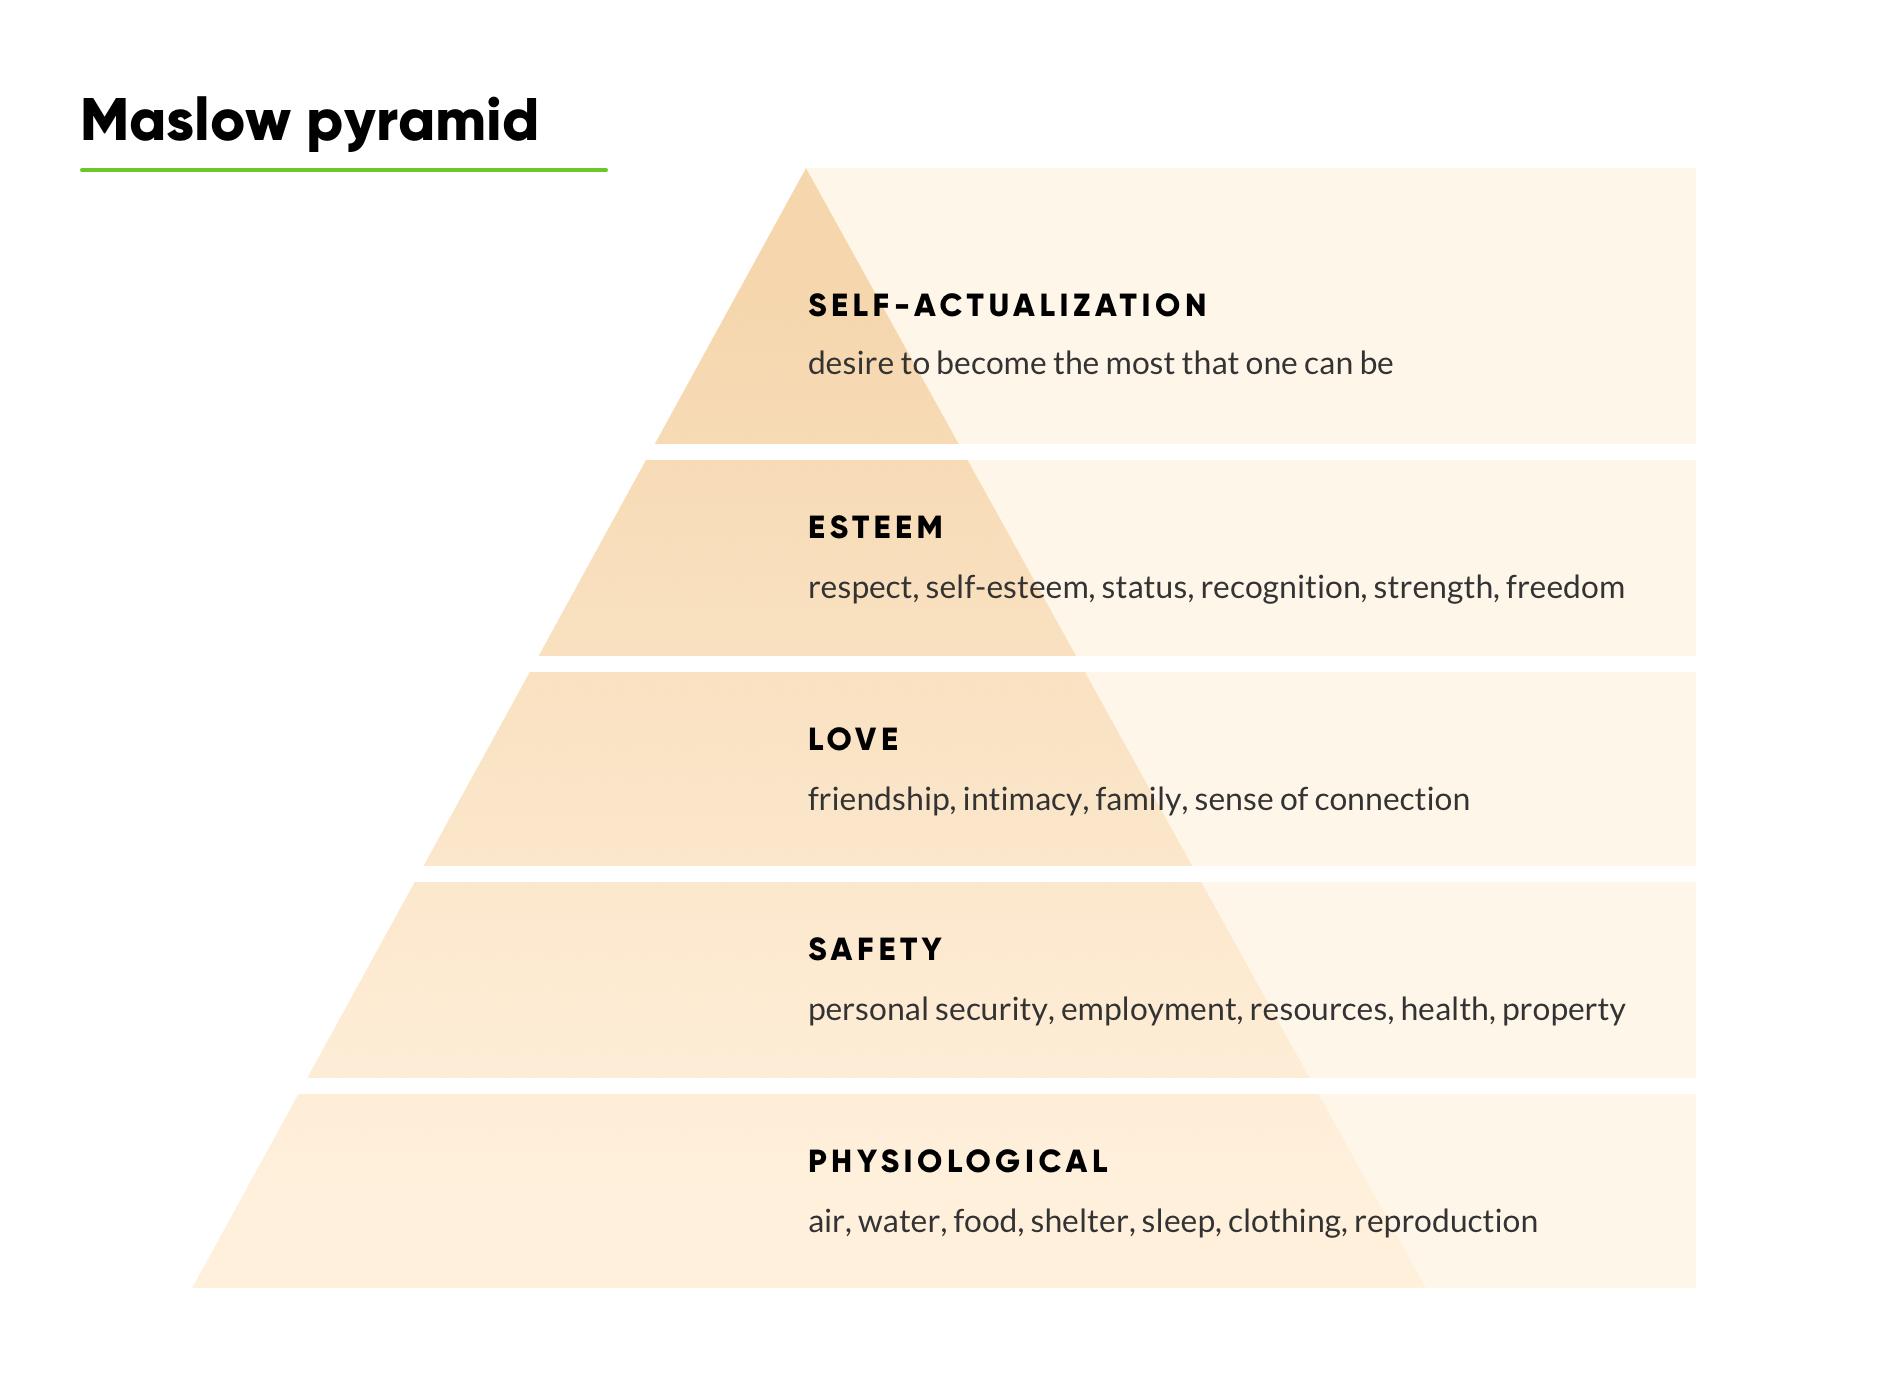 Maslow-pyramid-S.jpg